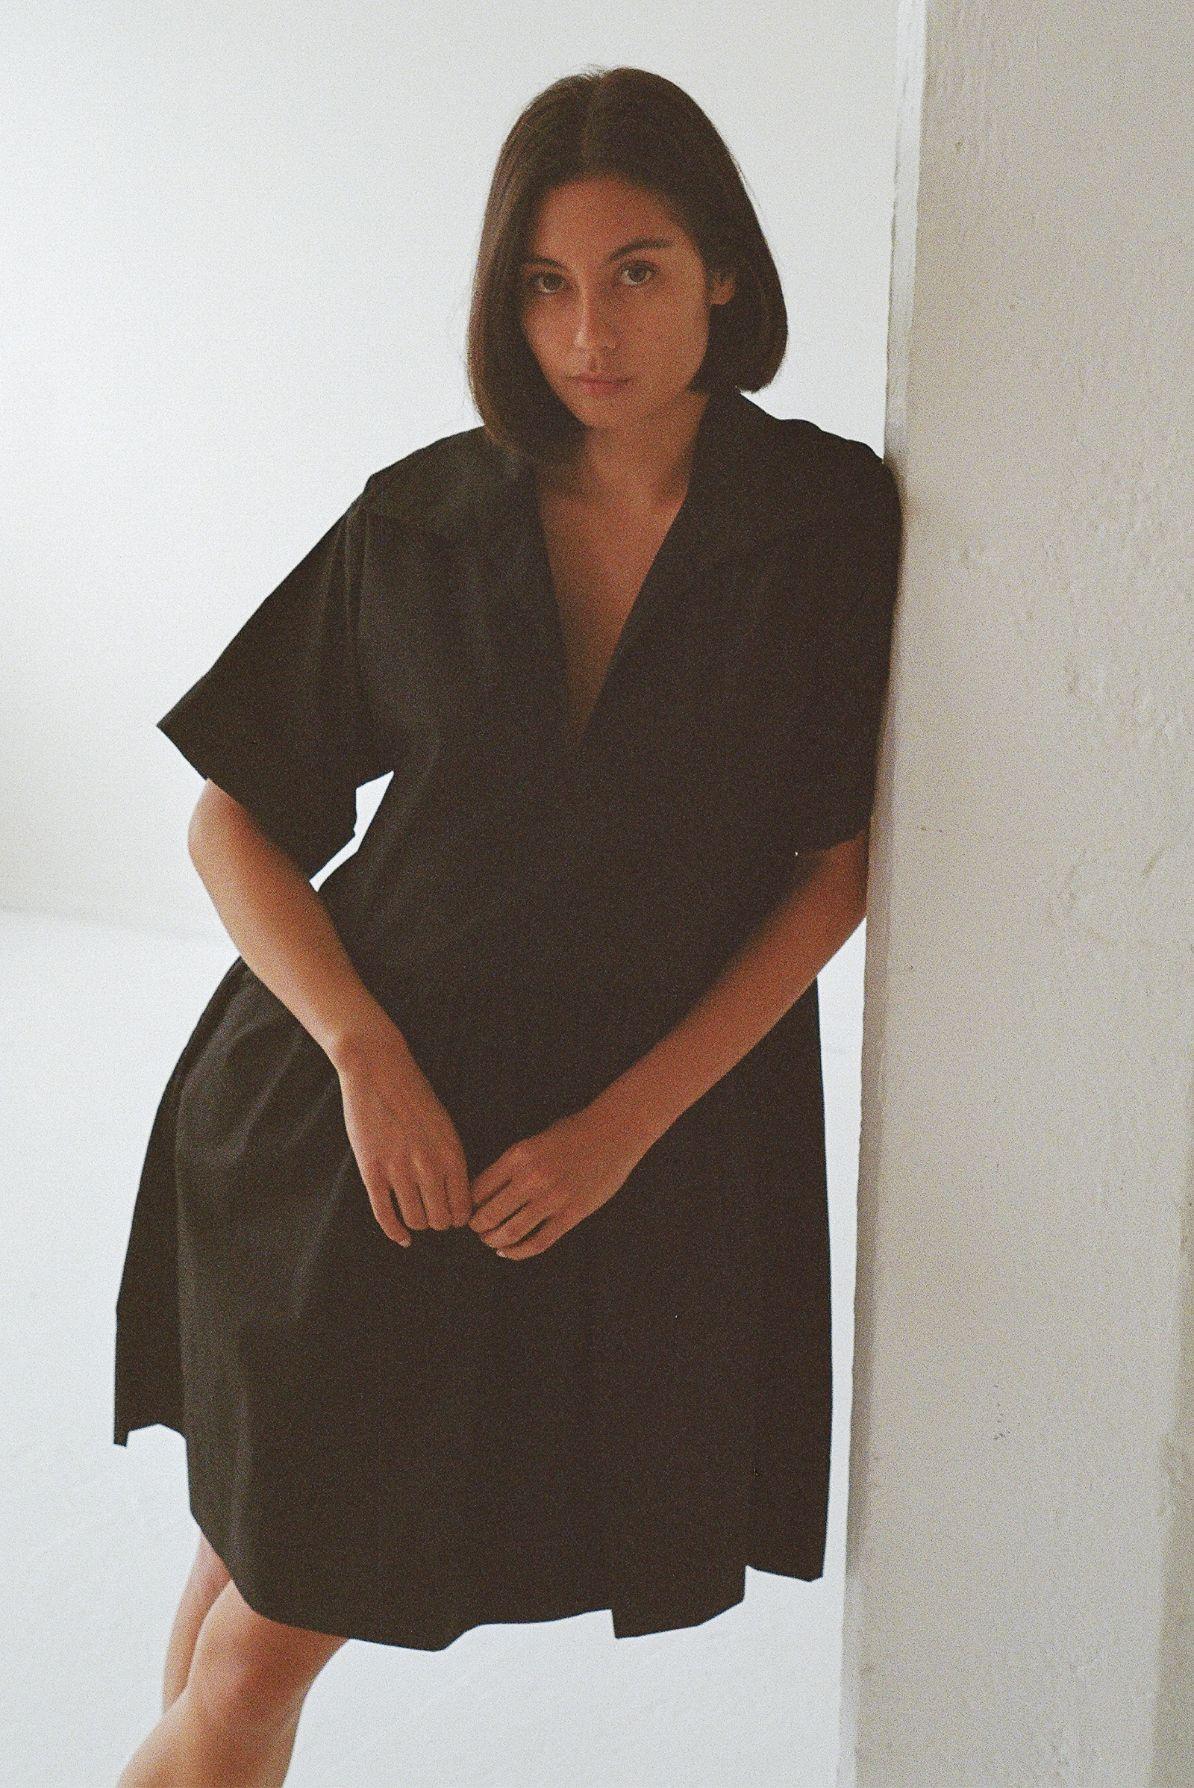 Daily dress - Black cotton poplin - Ellis Label_0049_83070015